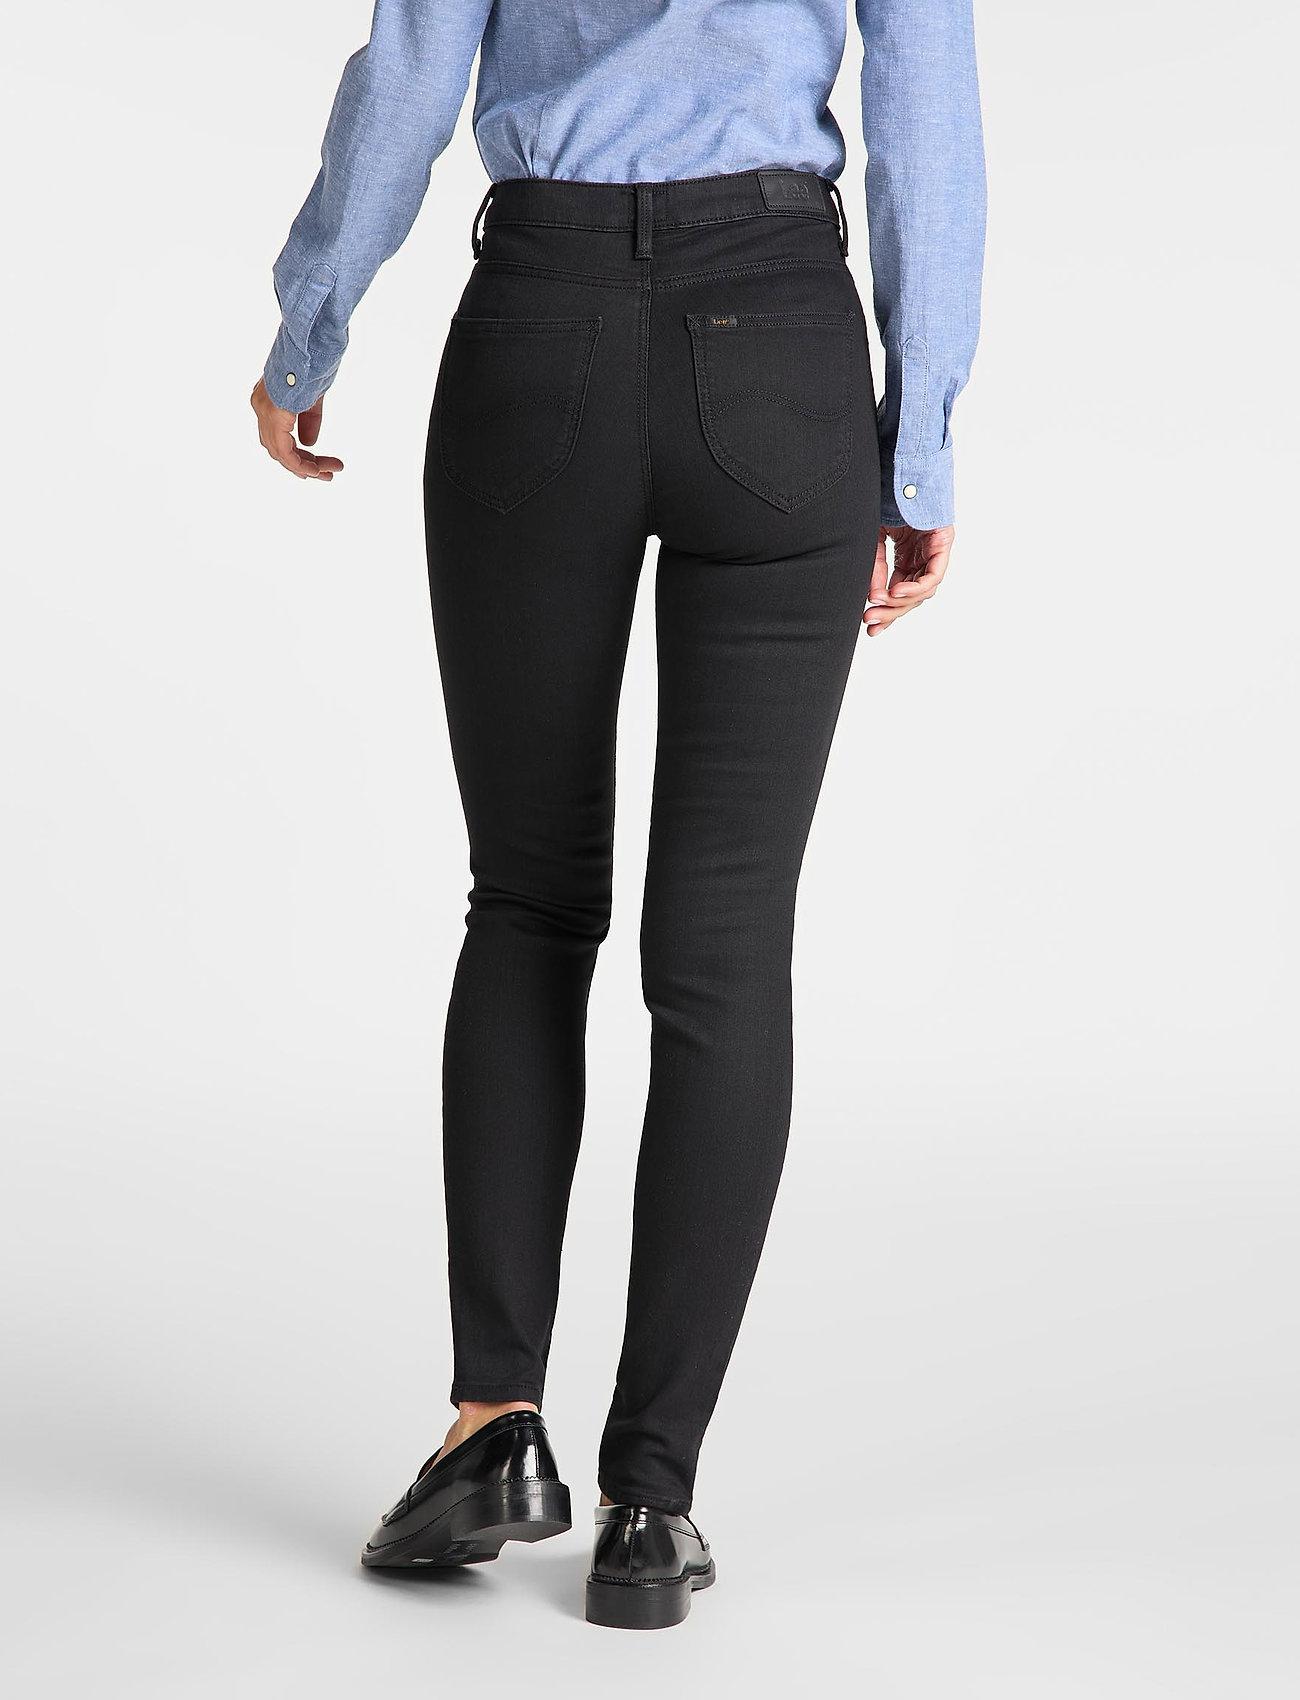 Lee Jeans - SCARLETT HIGH - skinny jeans - black rinse - 3